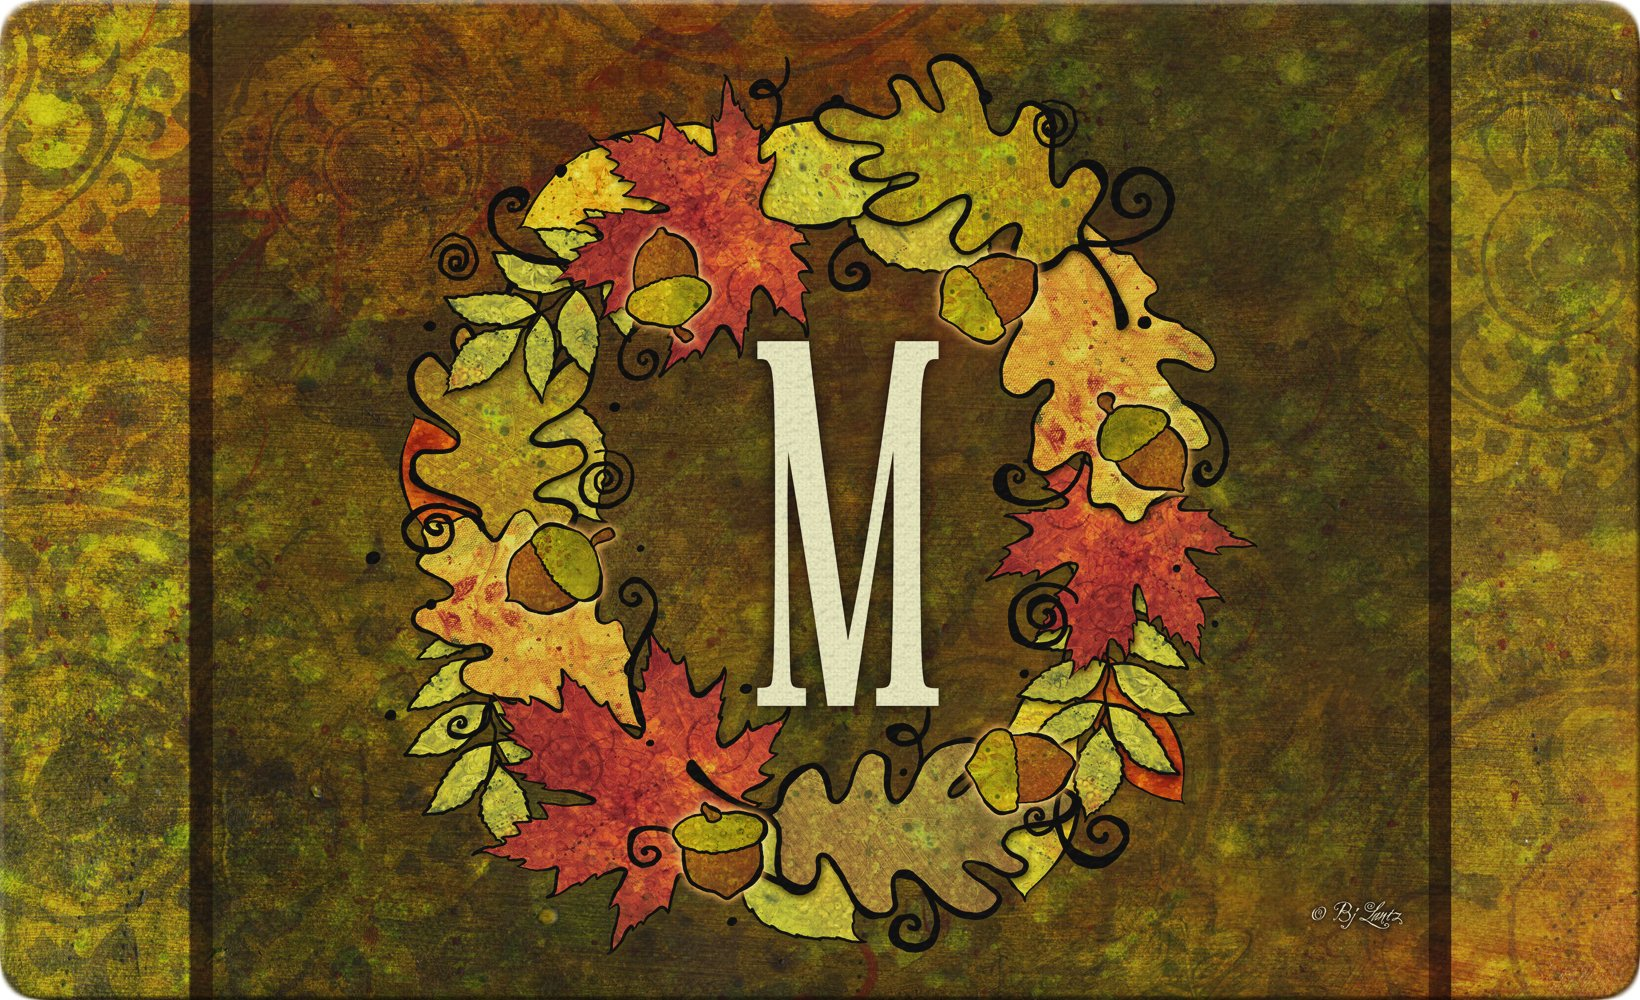 silk flower arrangements toland home garden fall wreath monogram m 18 x 30 inch decorative autumn floor mat colorful leaves doormat